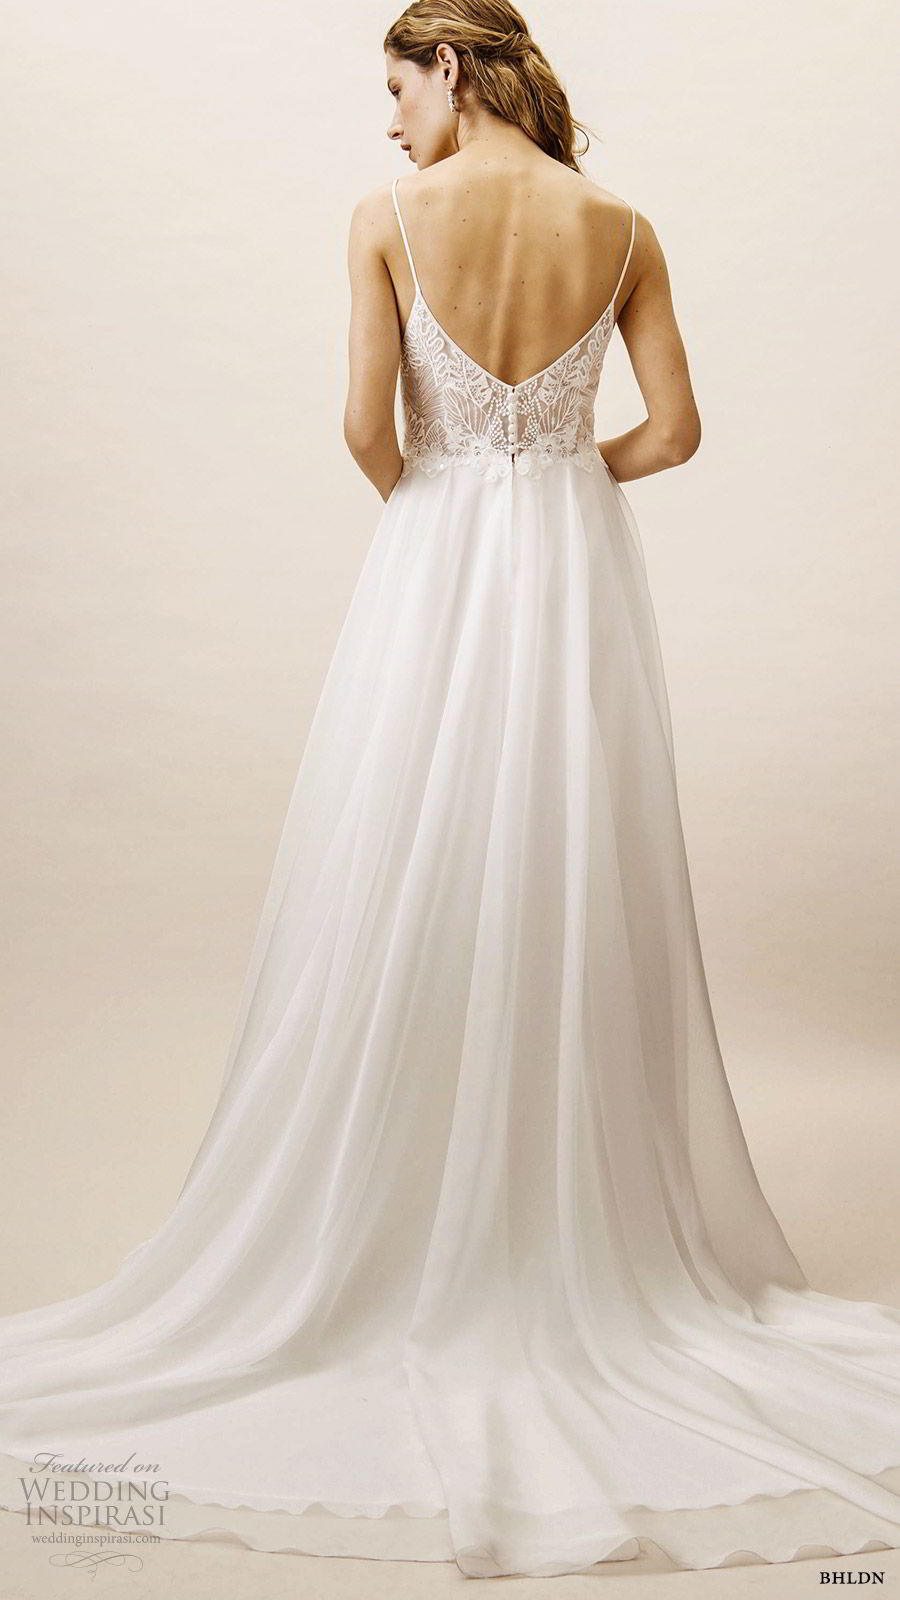 bhldn spring 2019 bridal sleeveless thin straps sweetheart v neckline embellished bodice a line wedding dress scoop back chapel train (4) bv